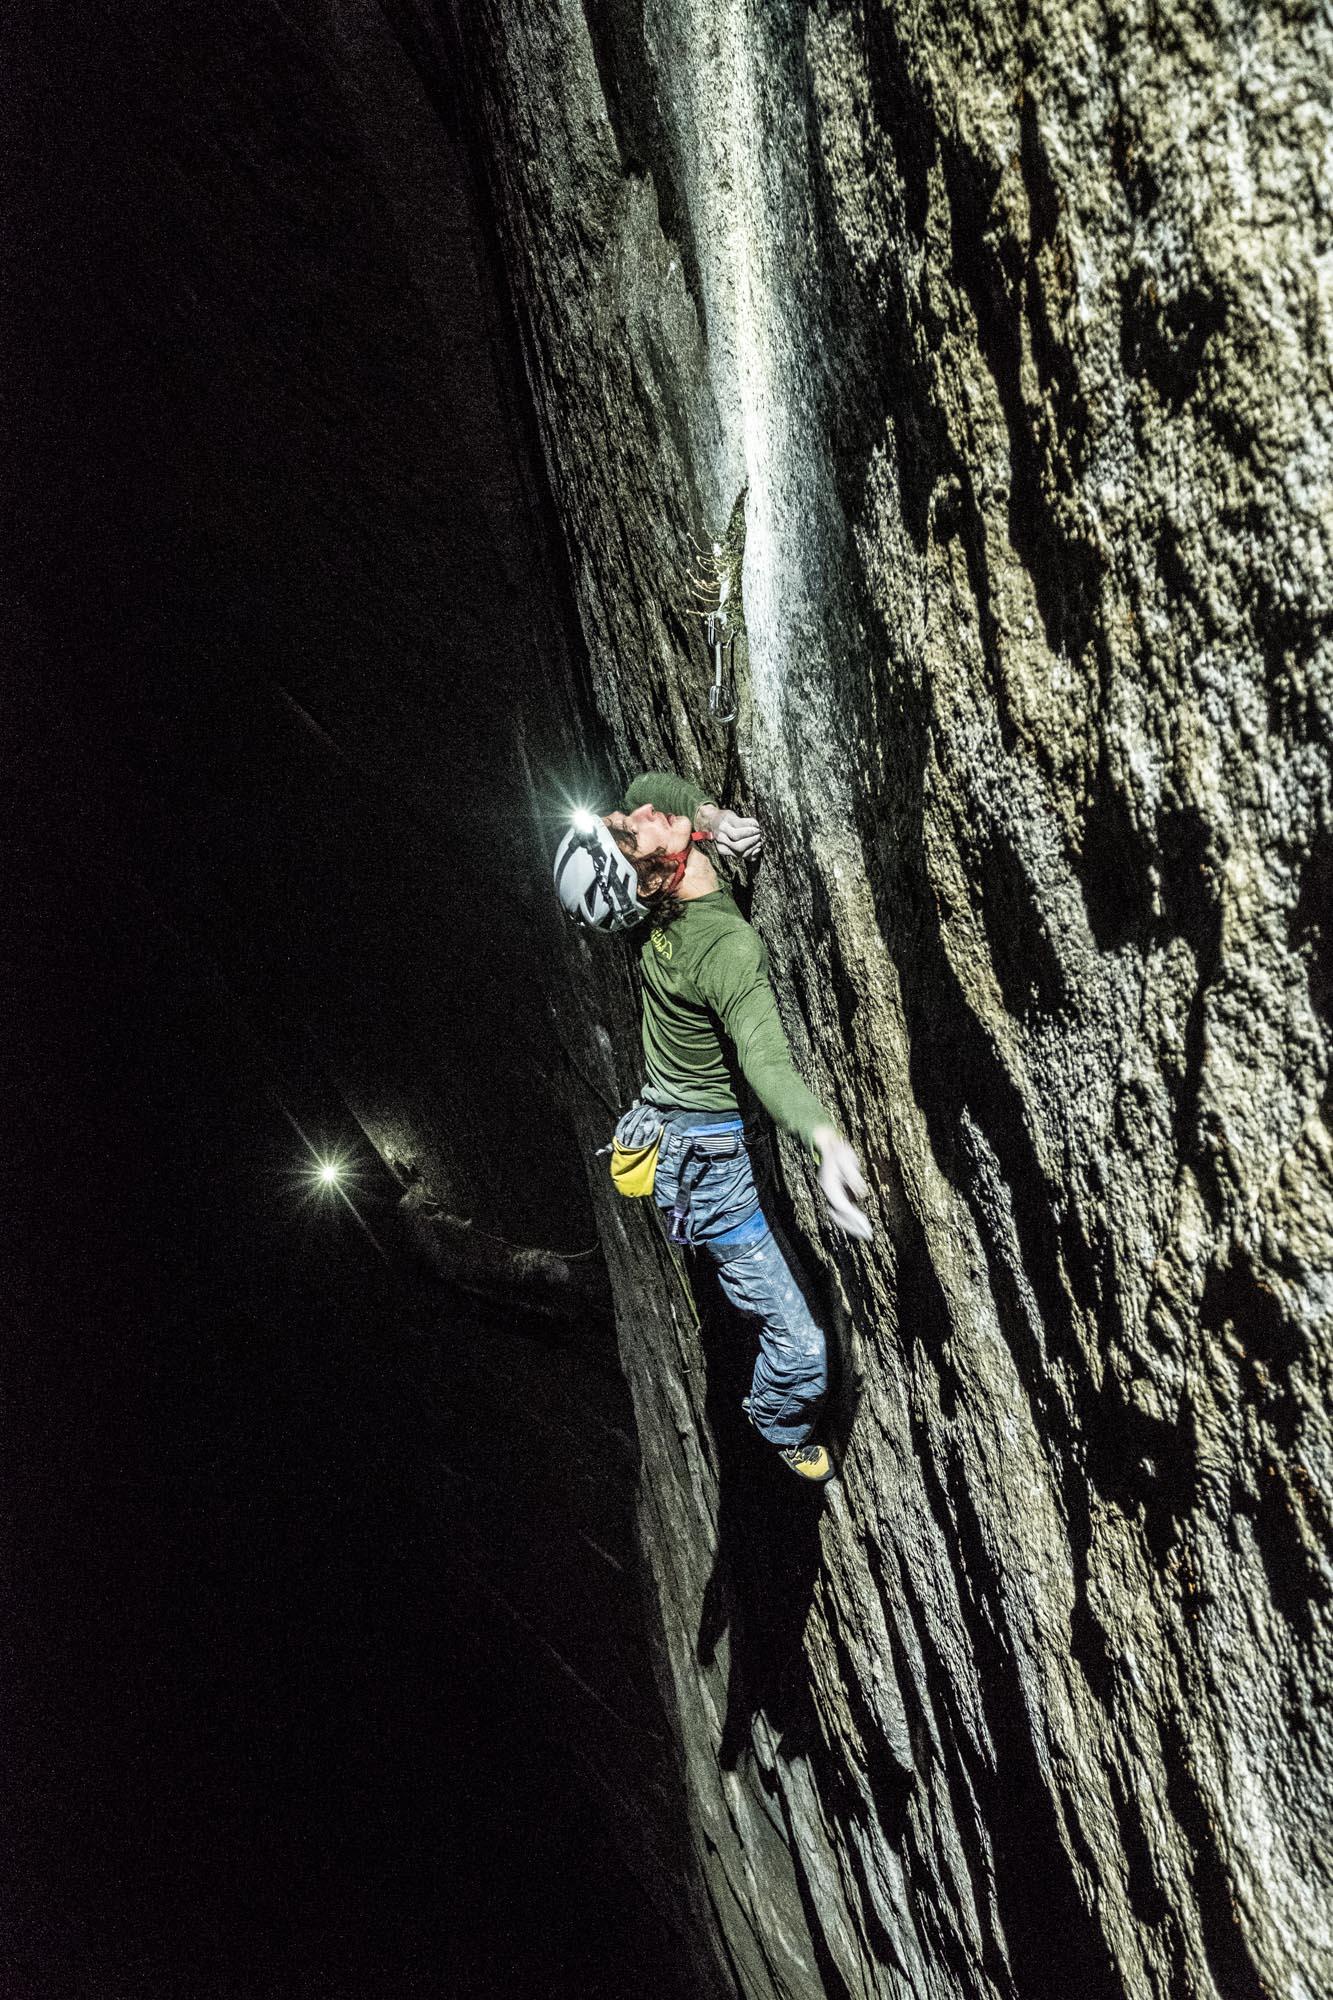 Adam Ondra climbing pitch 21 of the Dawn Wall by headlamp. Photo Courtesy Heinz Zak/ Black Diamond Equipment